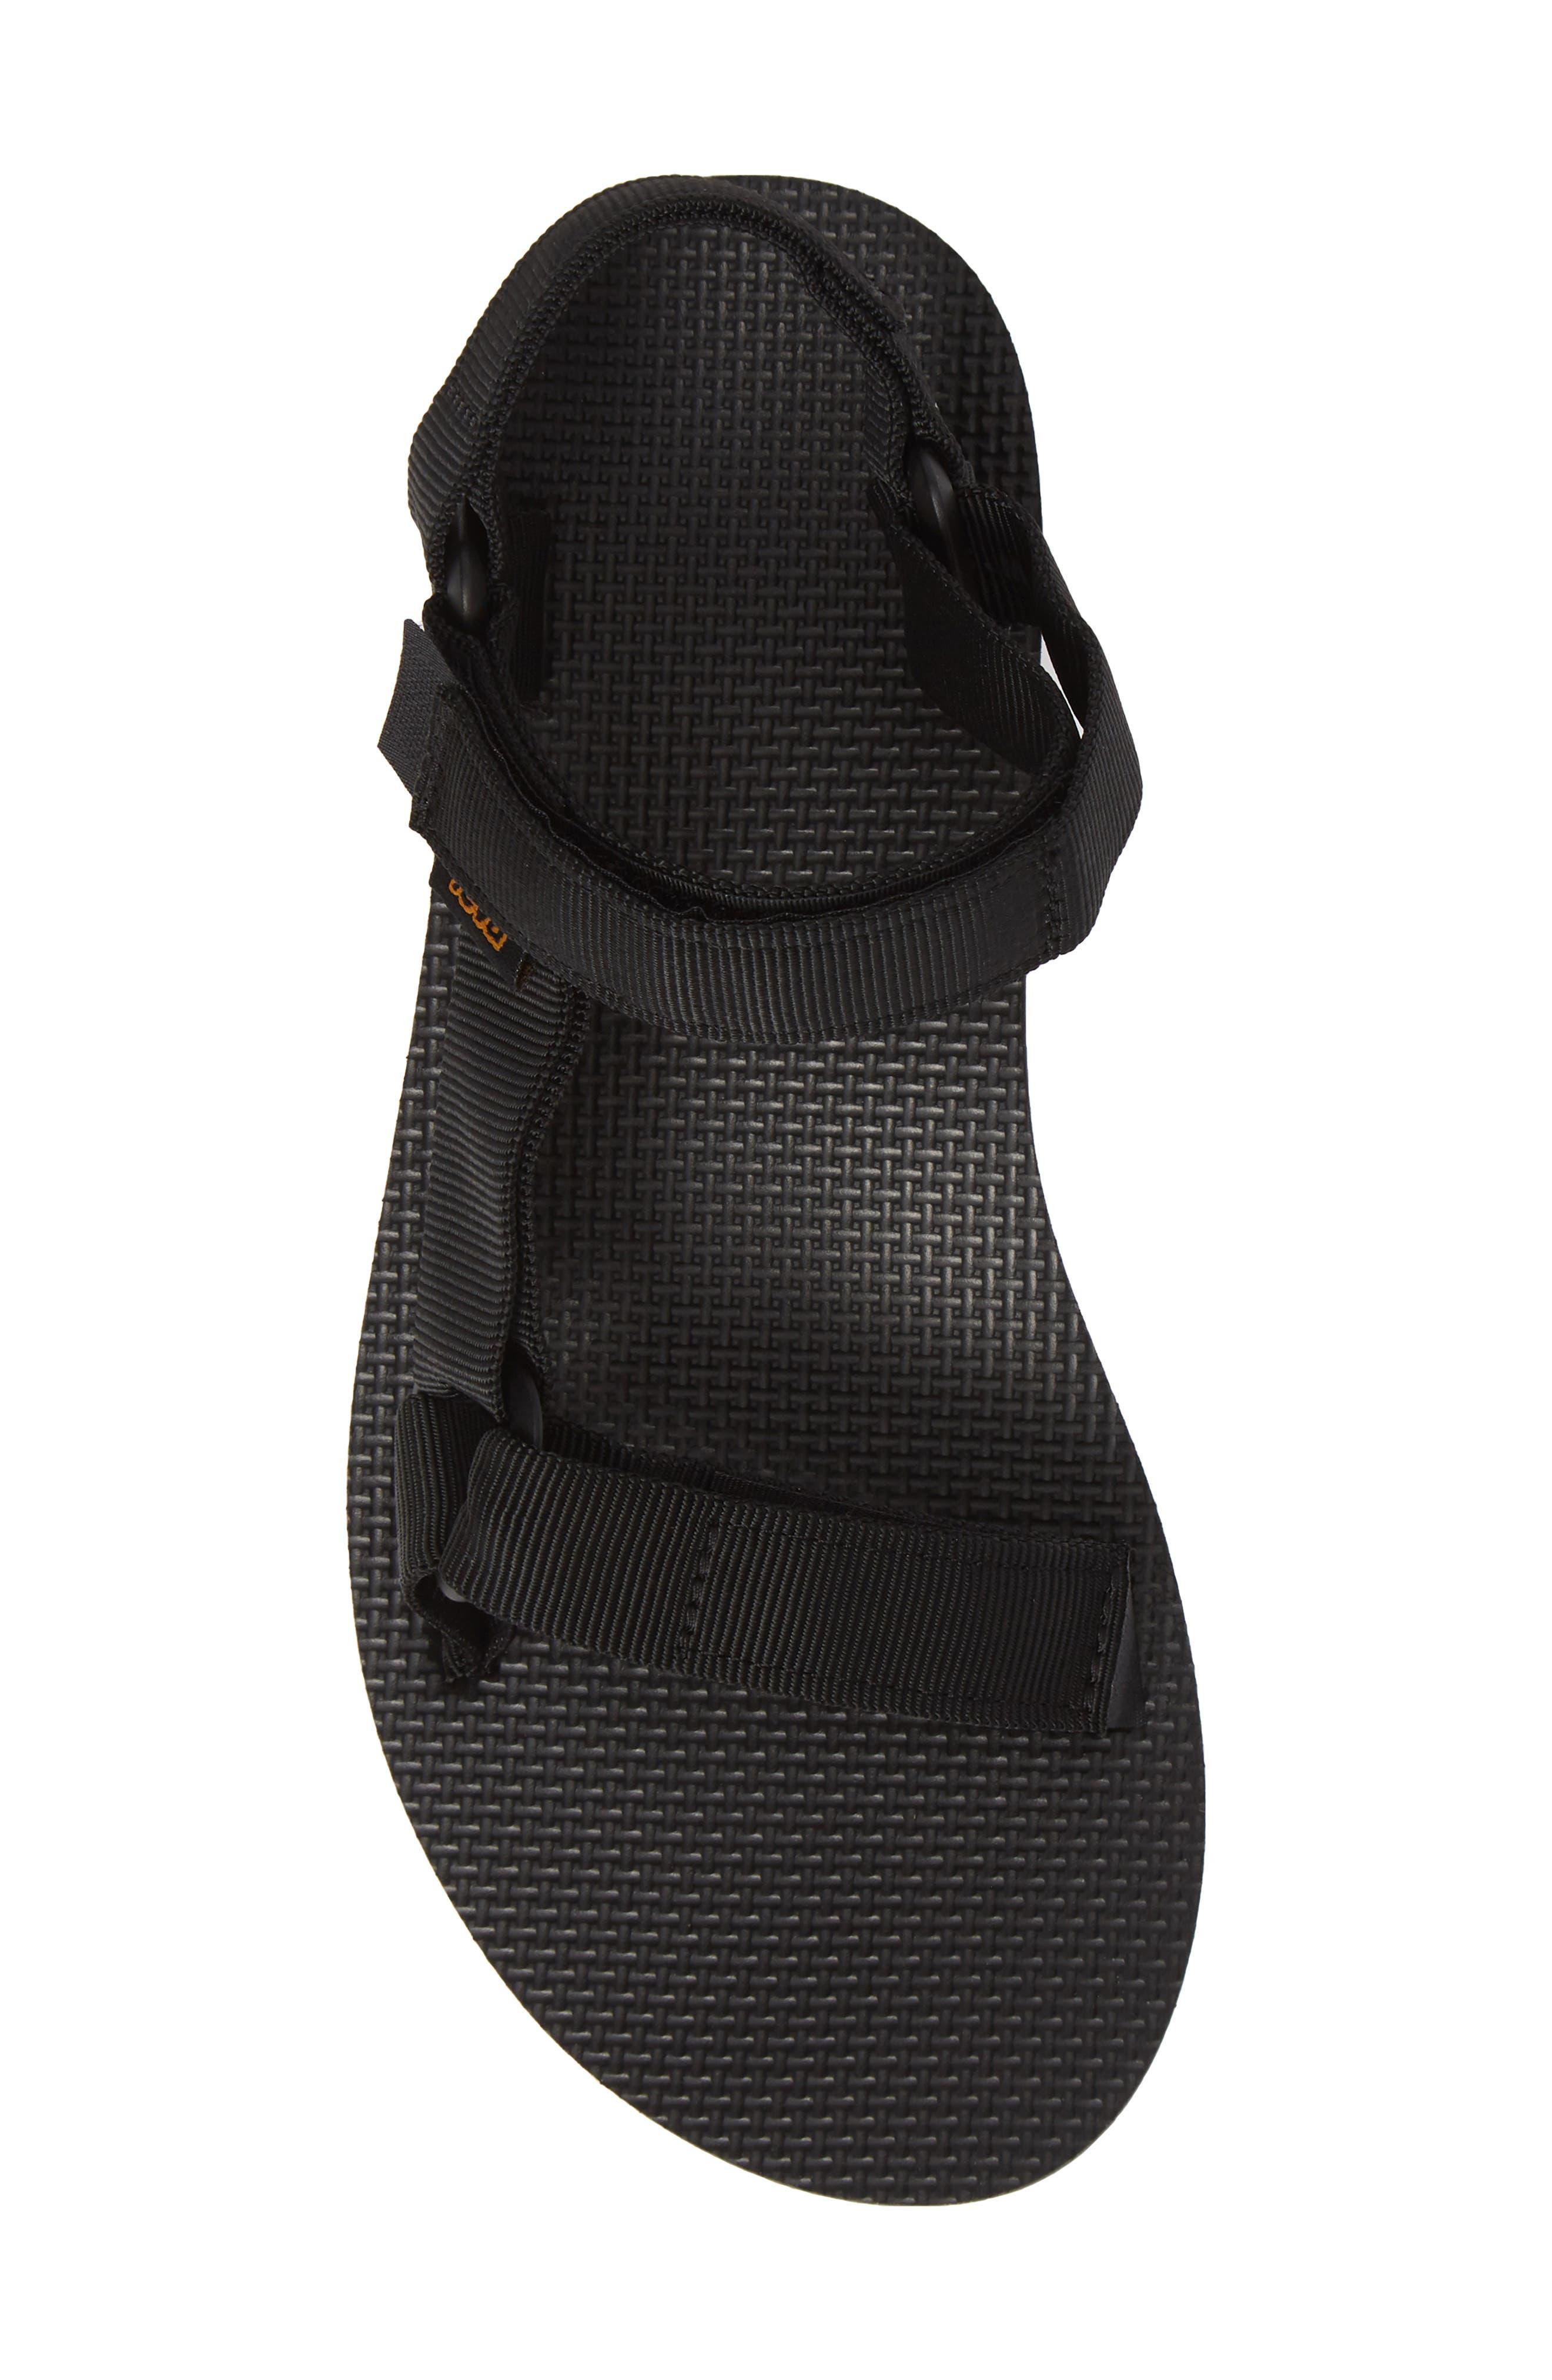 Midform Universal Geometric Sandal,                             Alternate thumbnail 5, color,                             BLACK FABRIC